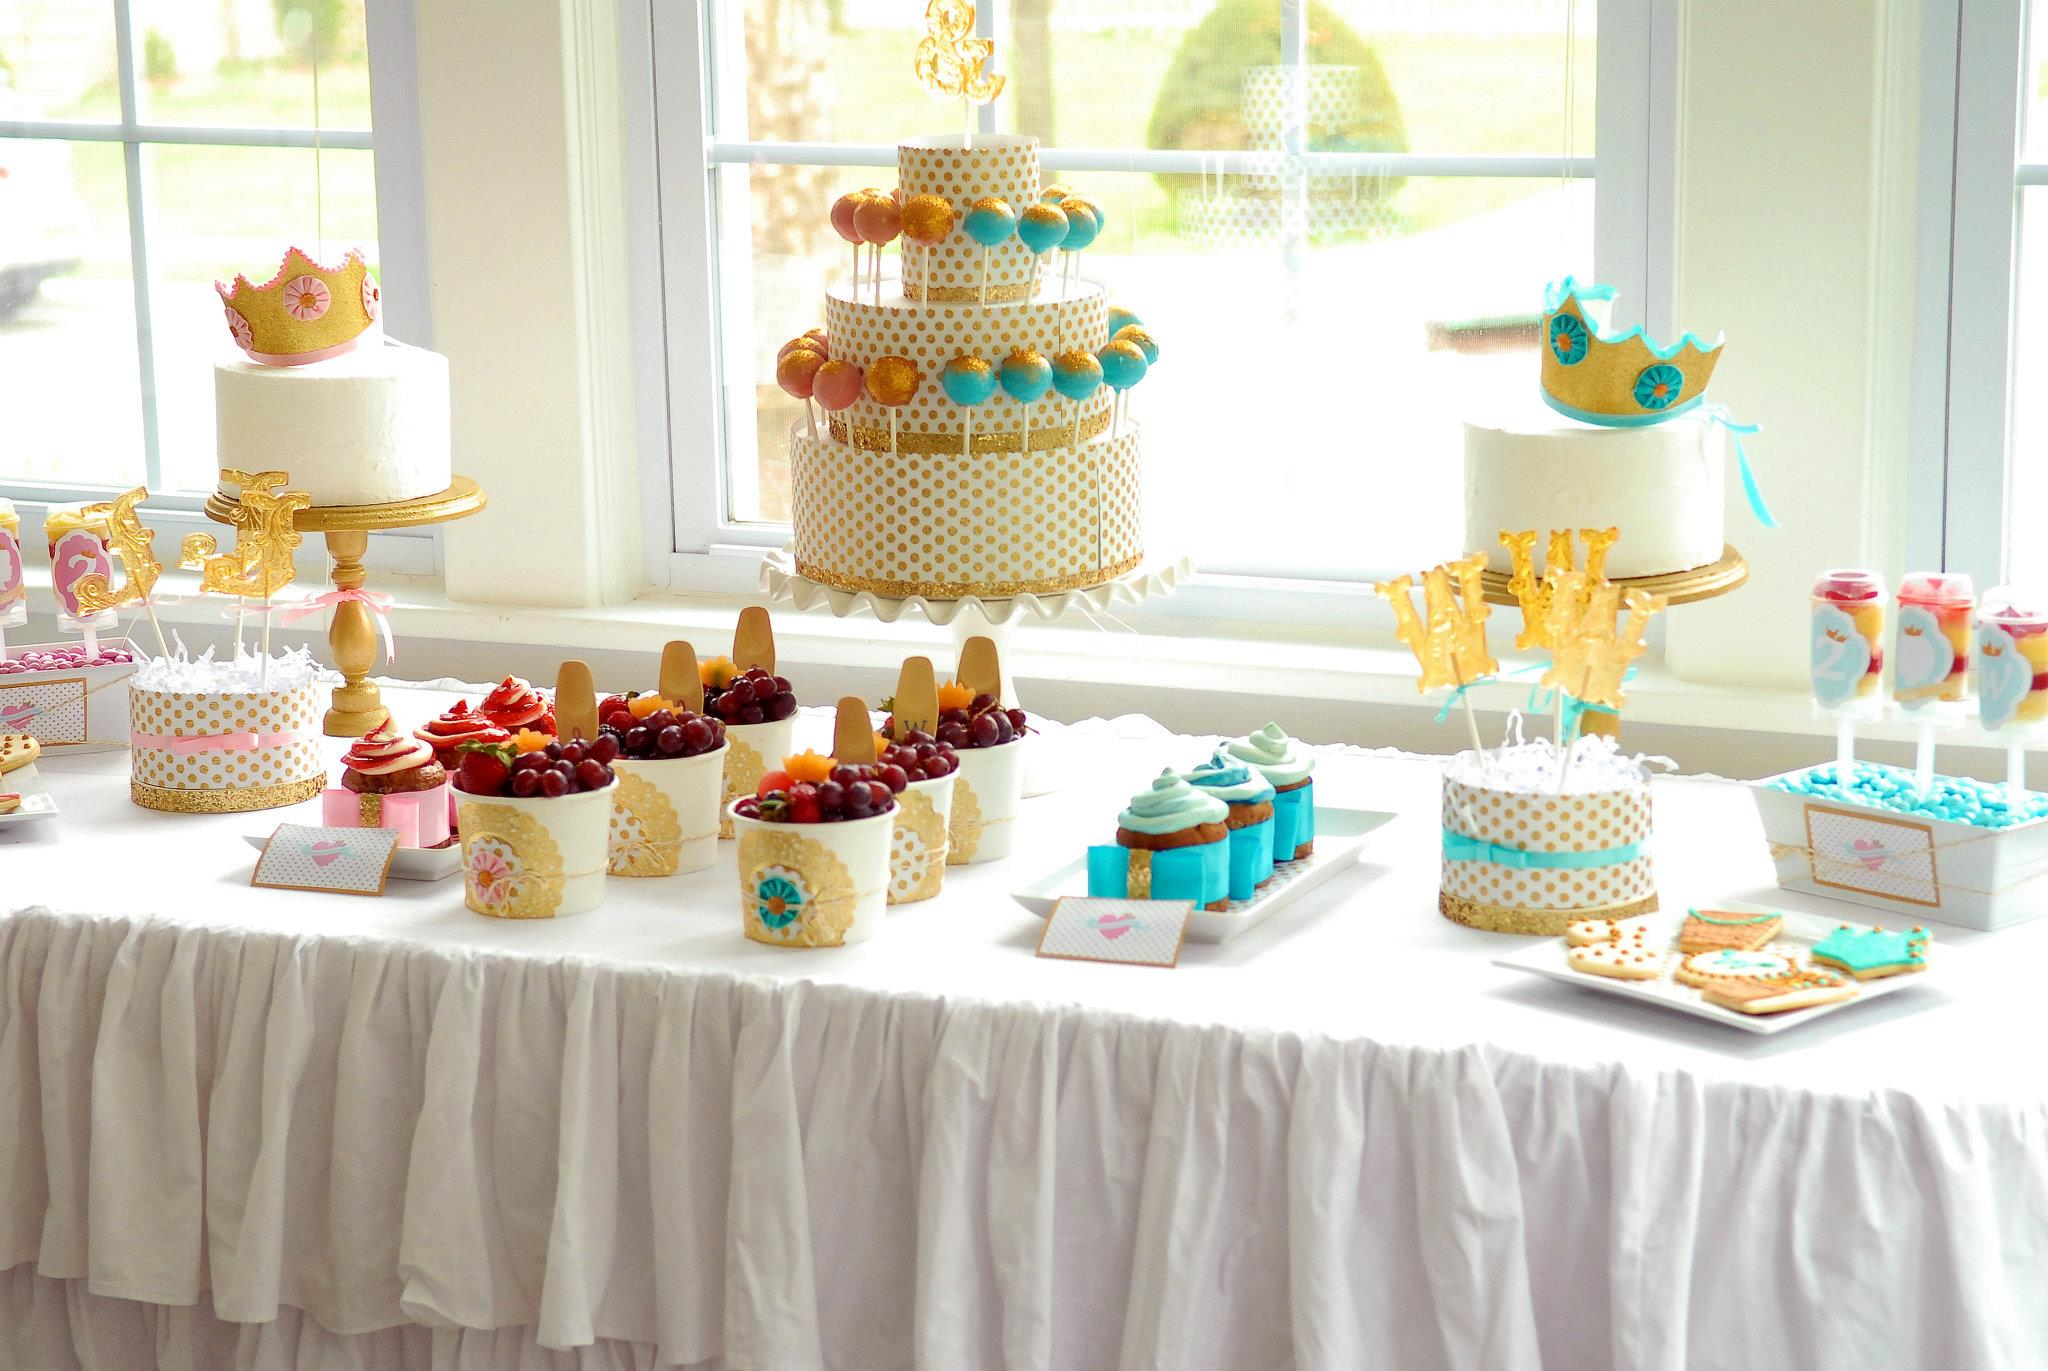 Jack Amp Jill Inspired Birthday Party Birthday Party Ideas